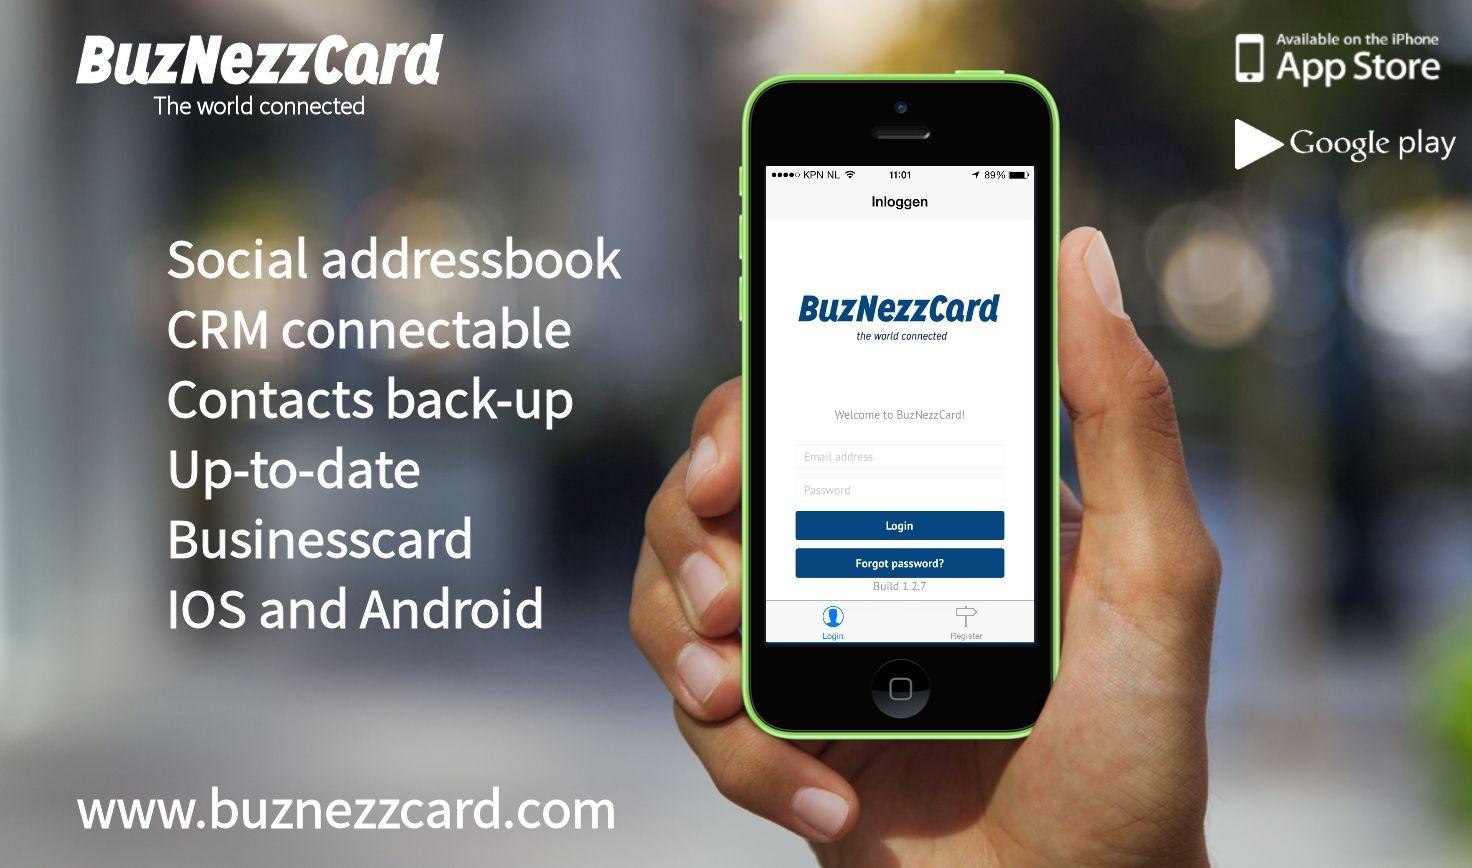 Buznezzcard login screen mockup  www.buznezzcard.com  #Buznezzcard #businesscard #visitekaartje #addressbook